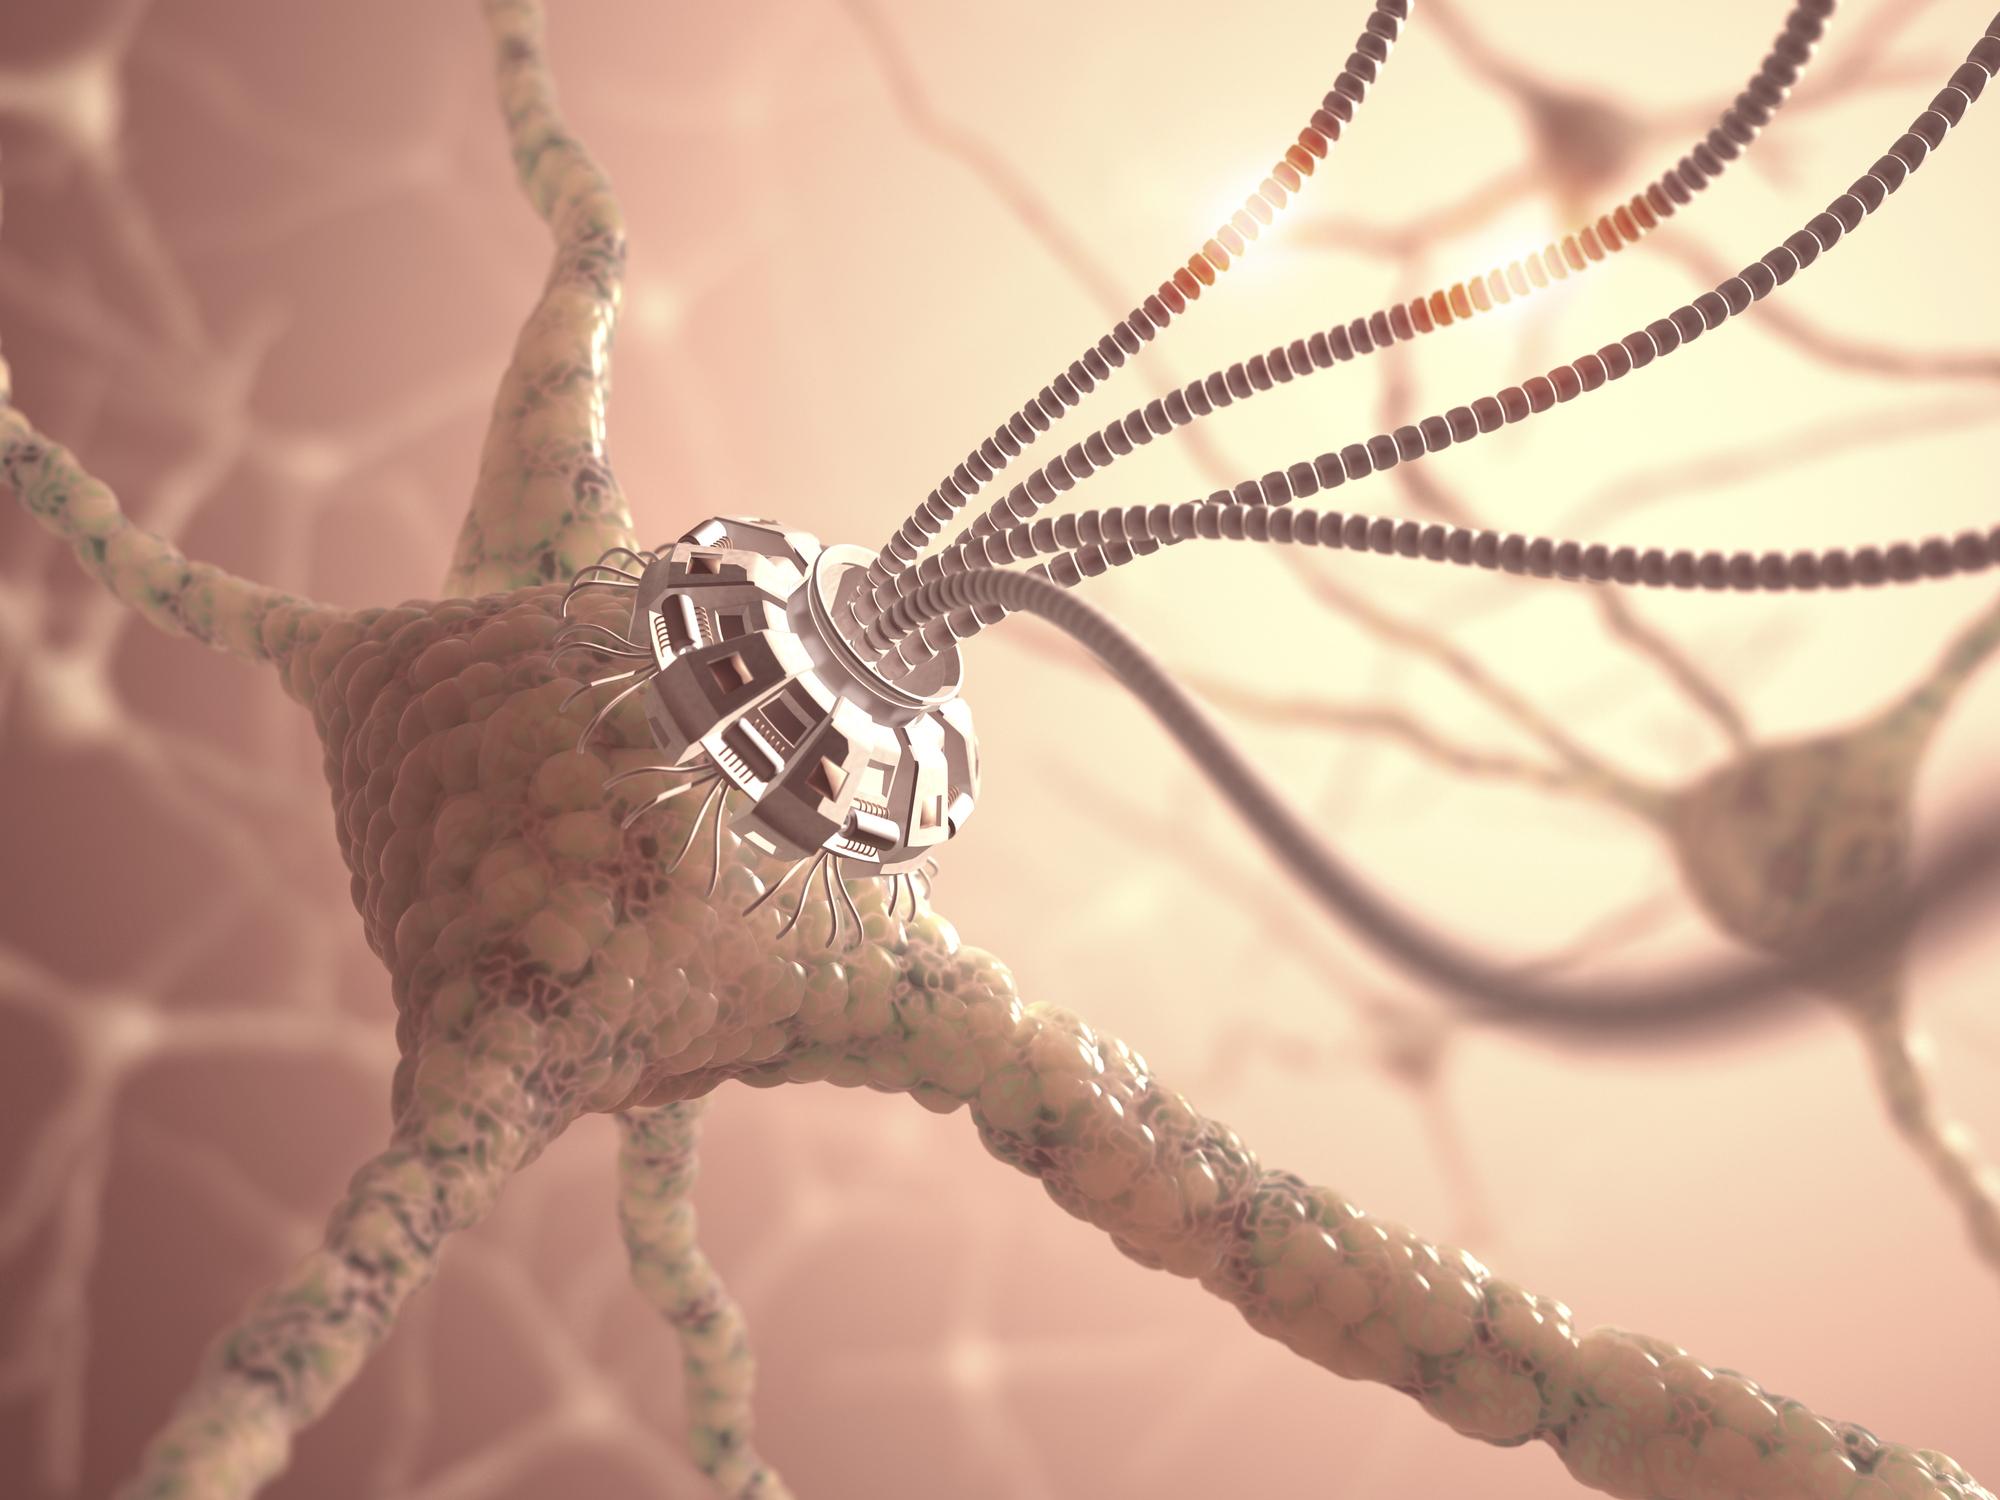 Biomedical hacking with nanotechnology